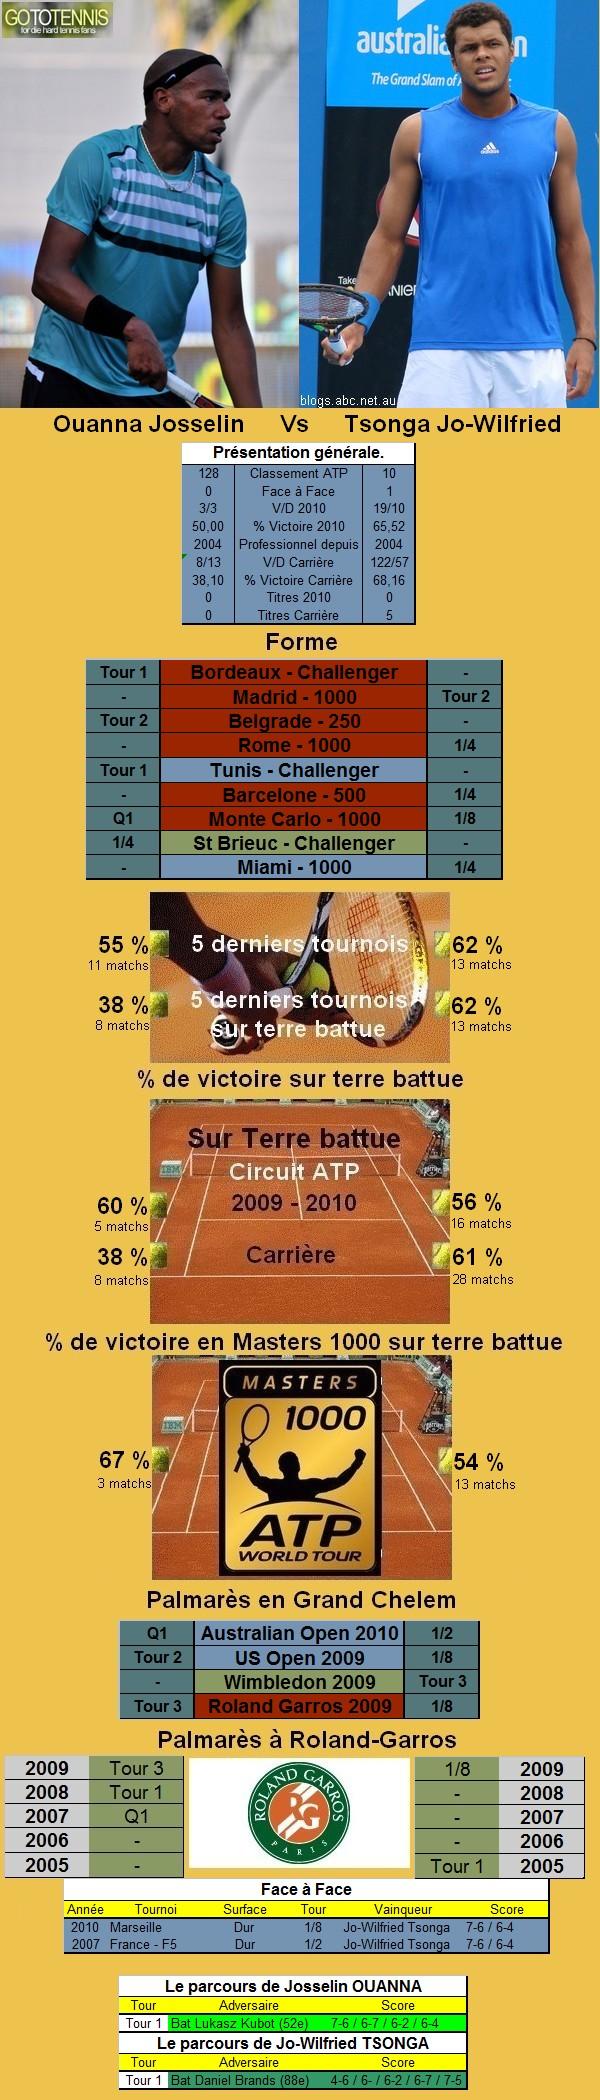 Statistiques tennis de Ouanna contre Tsonga à Roland Garros